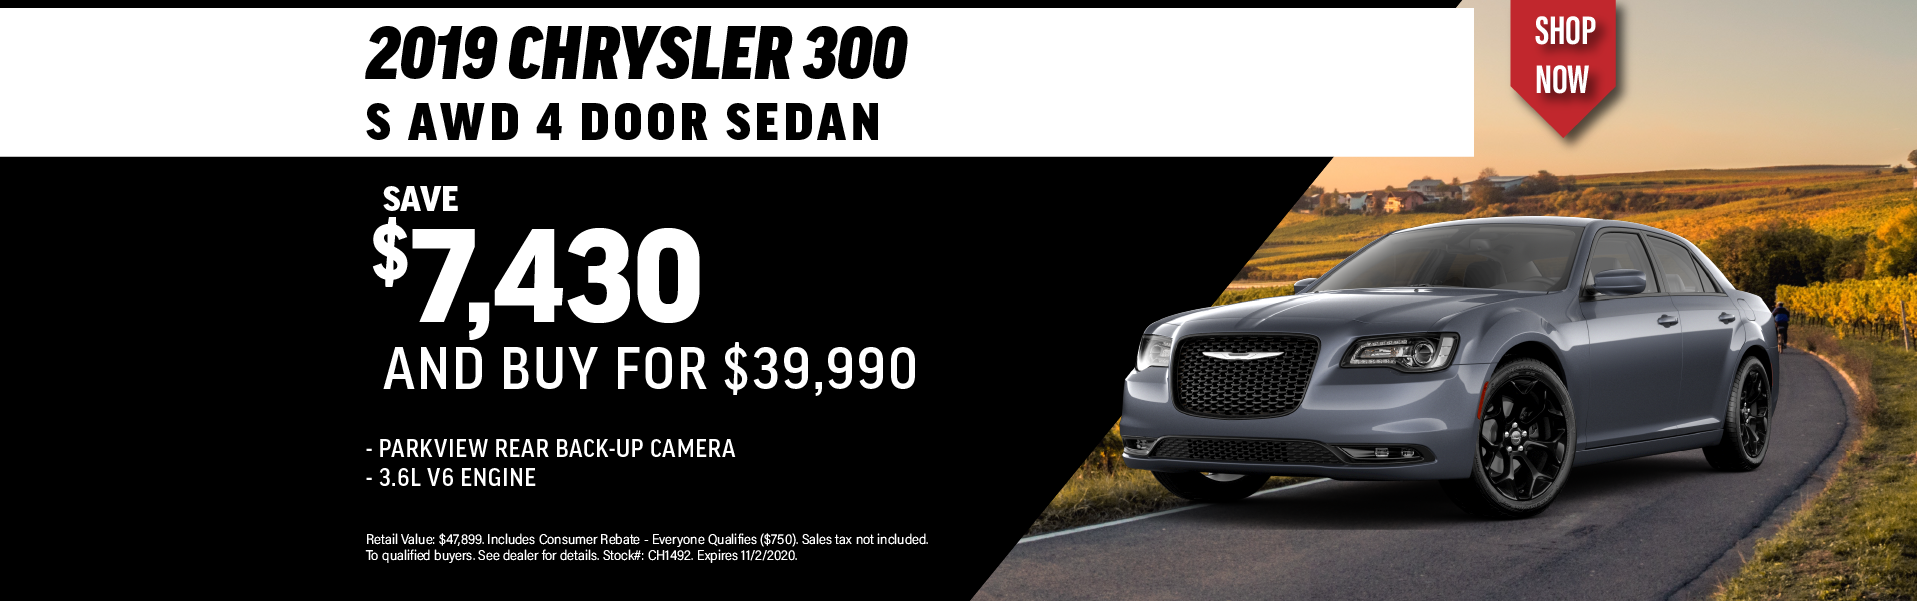 Quirk 2019 Chrysler 300- October 2020